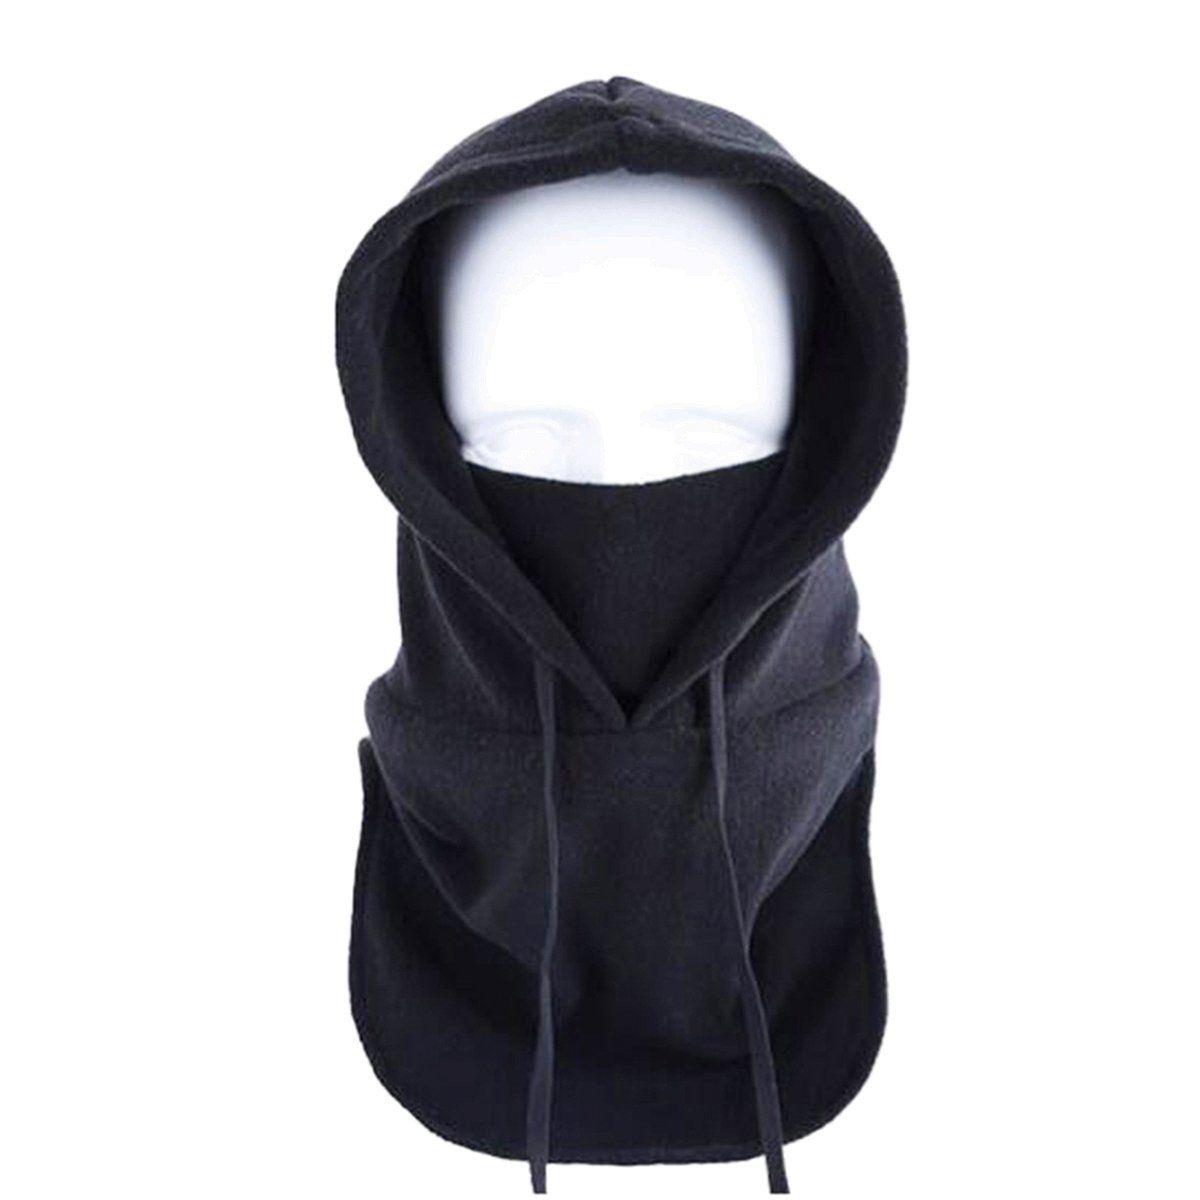 0eb0c9983a5 Triwonder Thermal Fleece Balaclava Hood Police Swat Ski Bike Wind Stopper  Mask (Black). Half Face ...